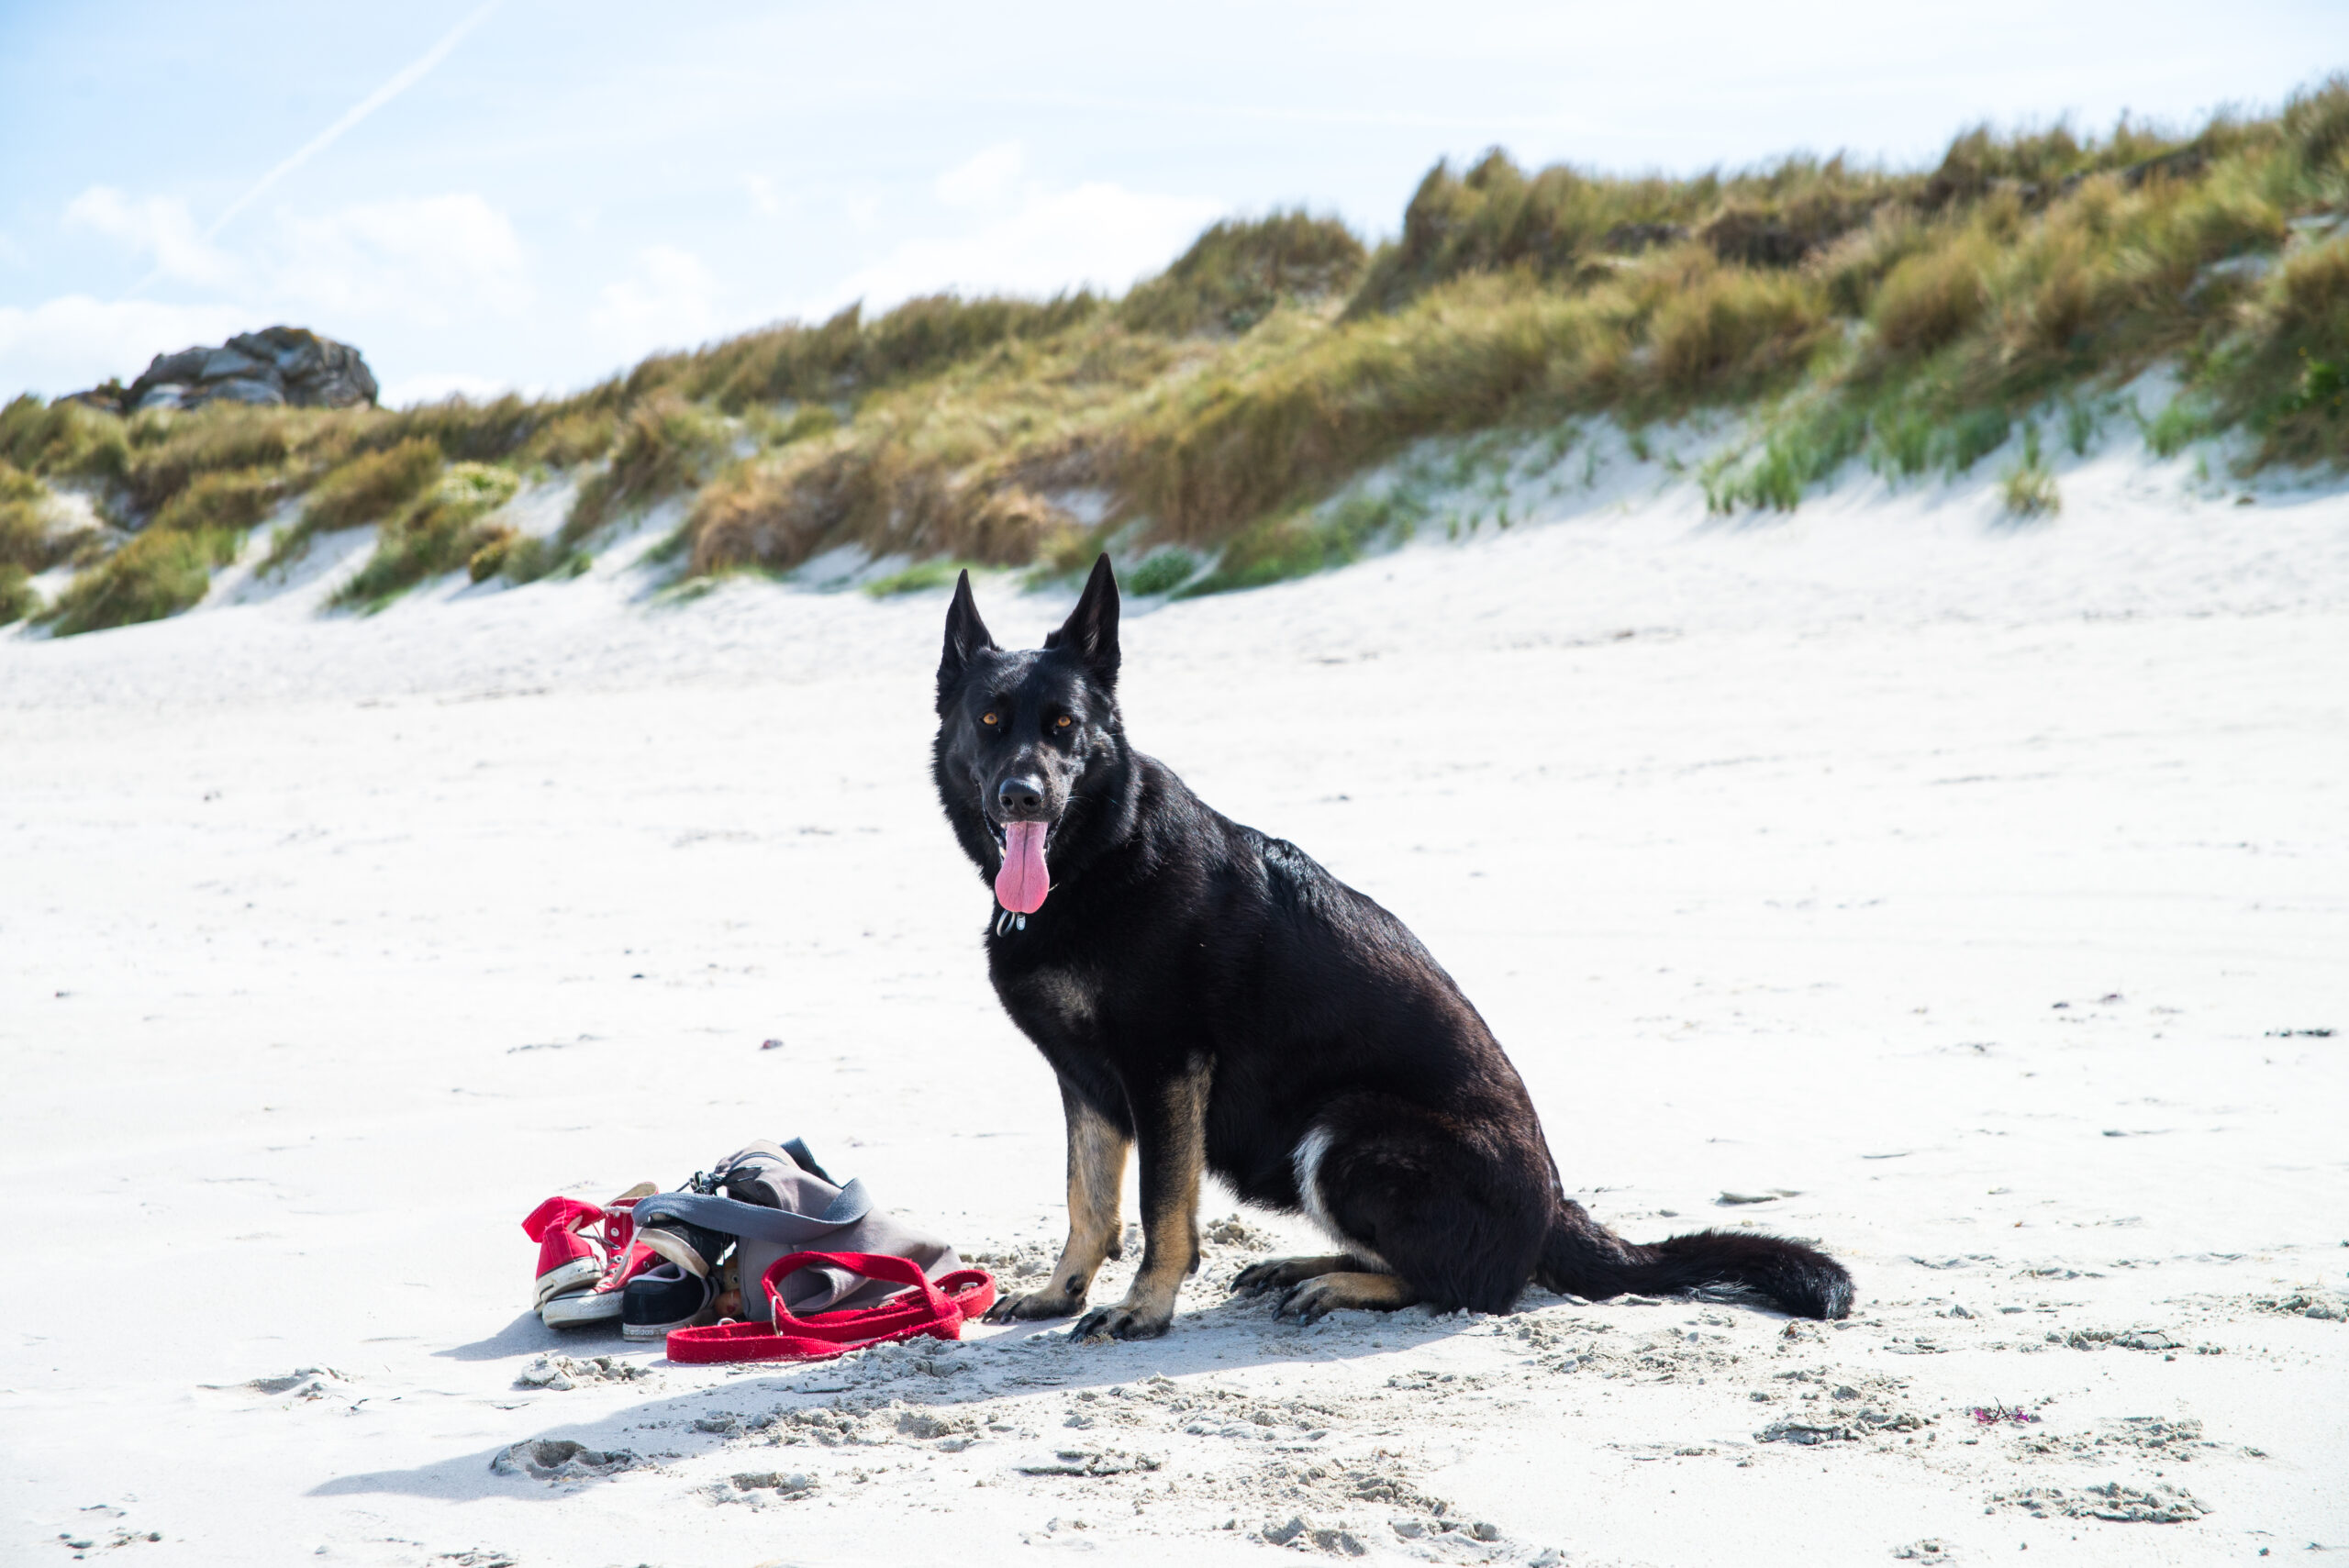 Frieda am Strand sitzend